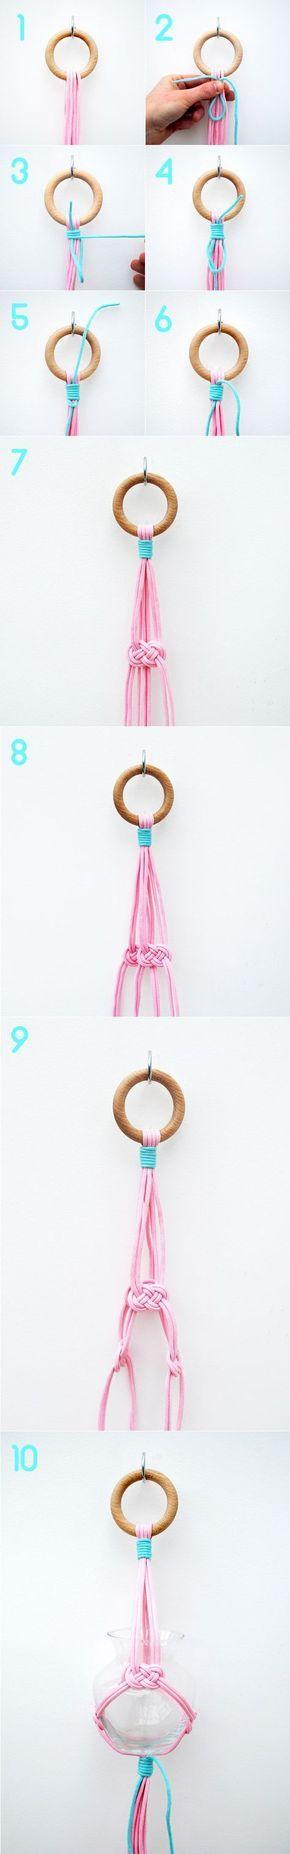 Simple hanging vase // Josephine knot & gathering knot | Mini-eco